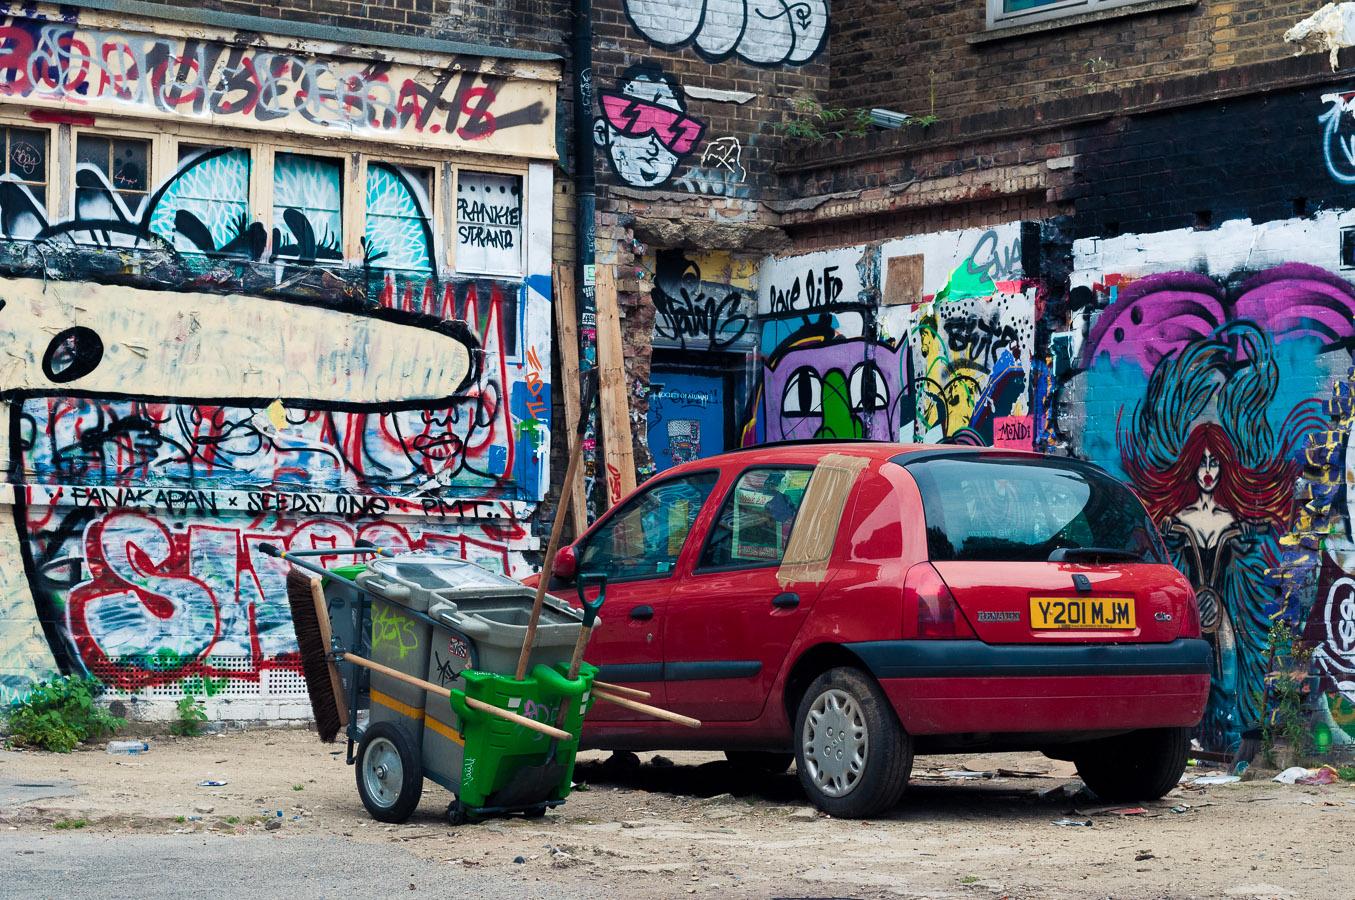 graffiti-renault-clio-bins.jpg